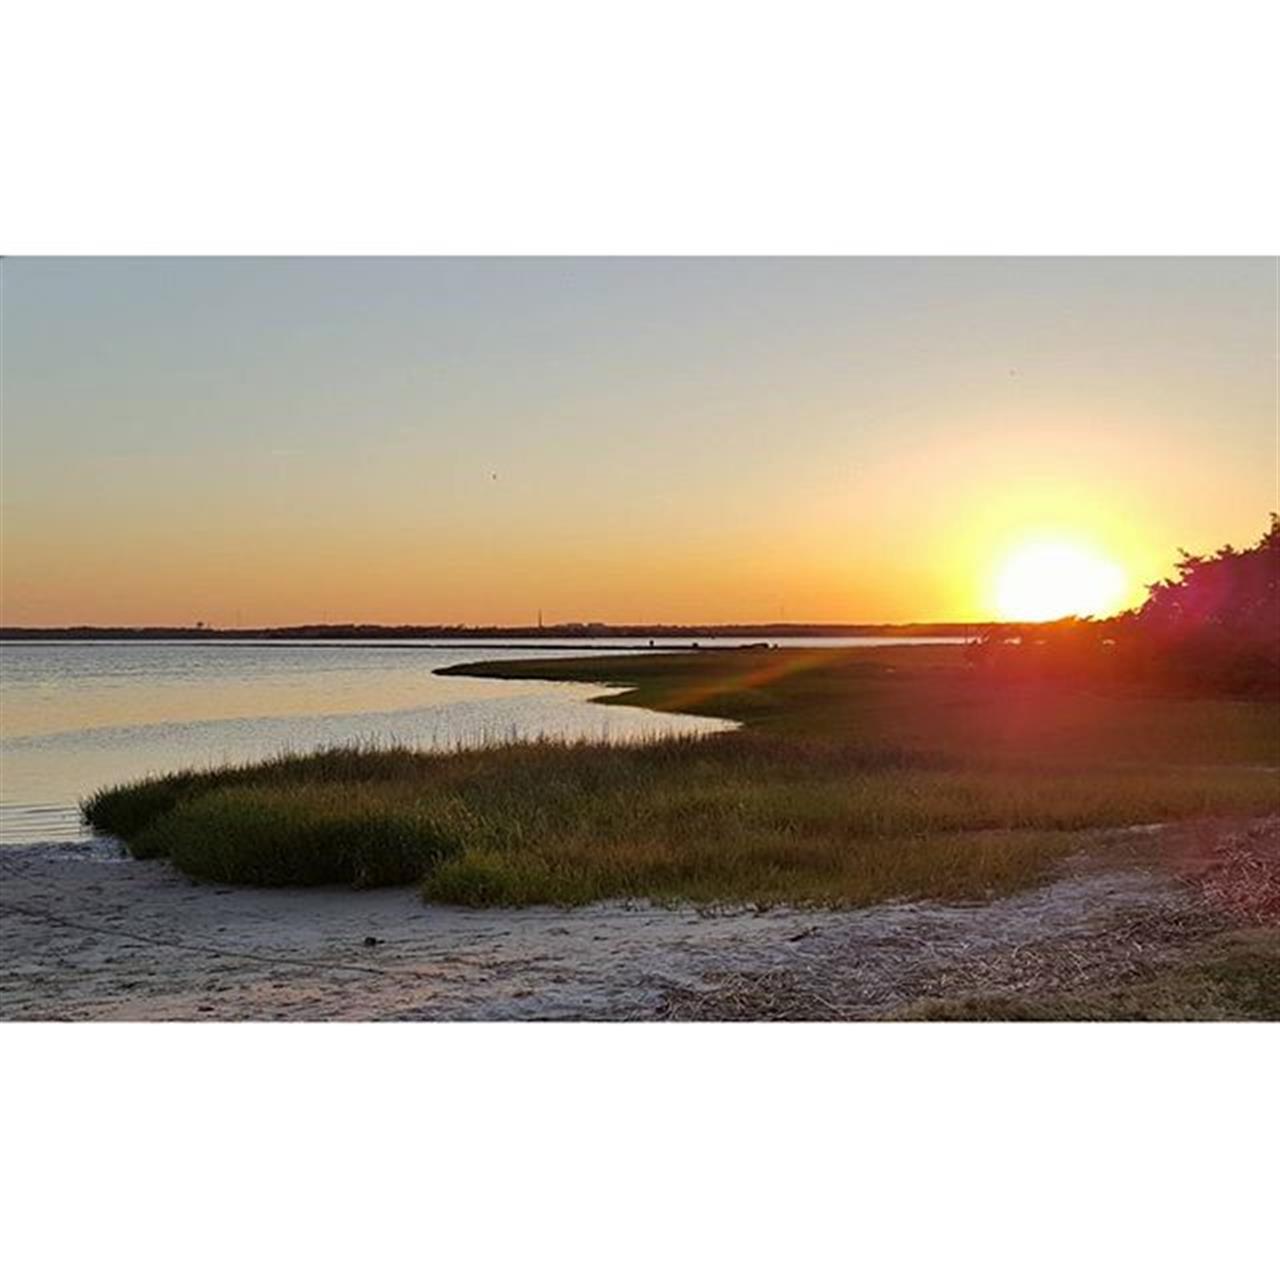 Beautiful sunset  #LeadingRElocal #ILMingIt #LoveWhereILive